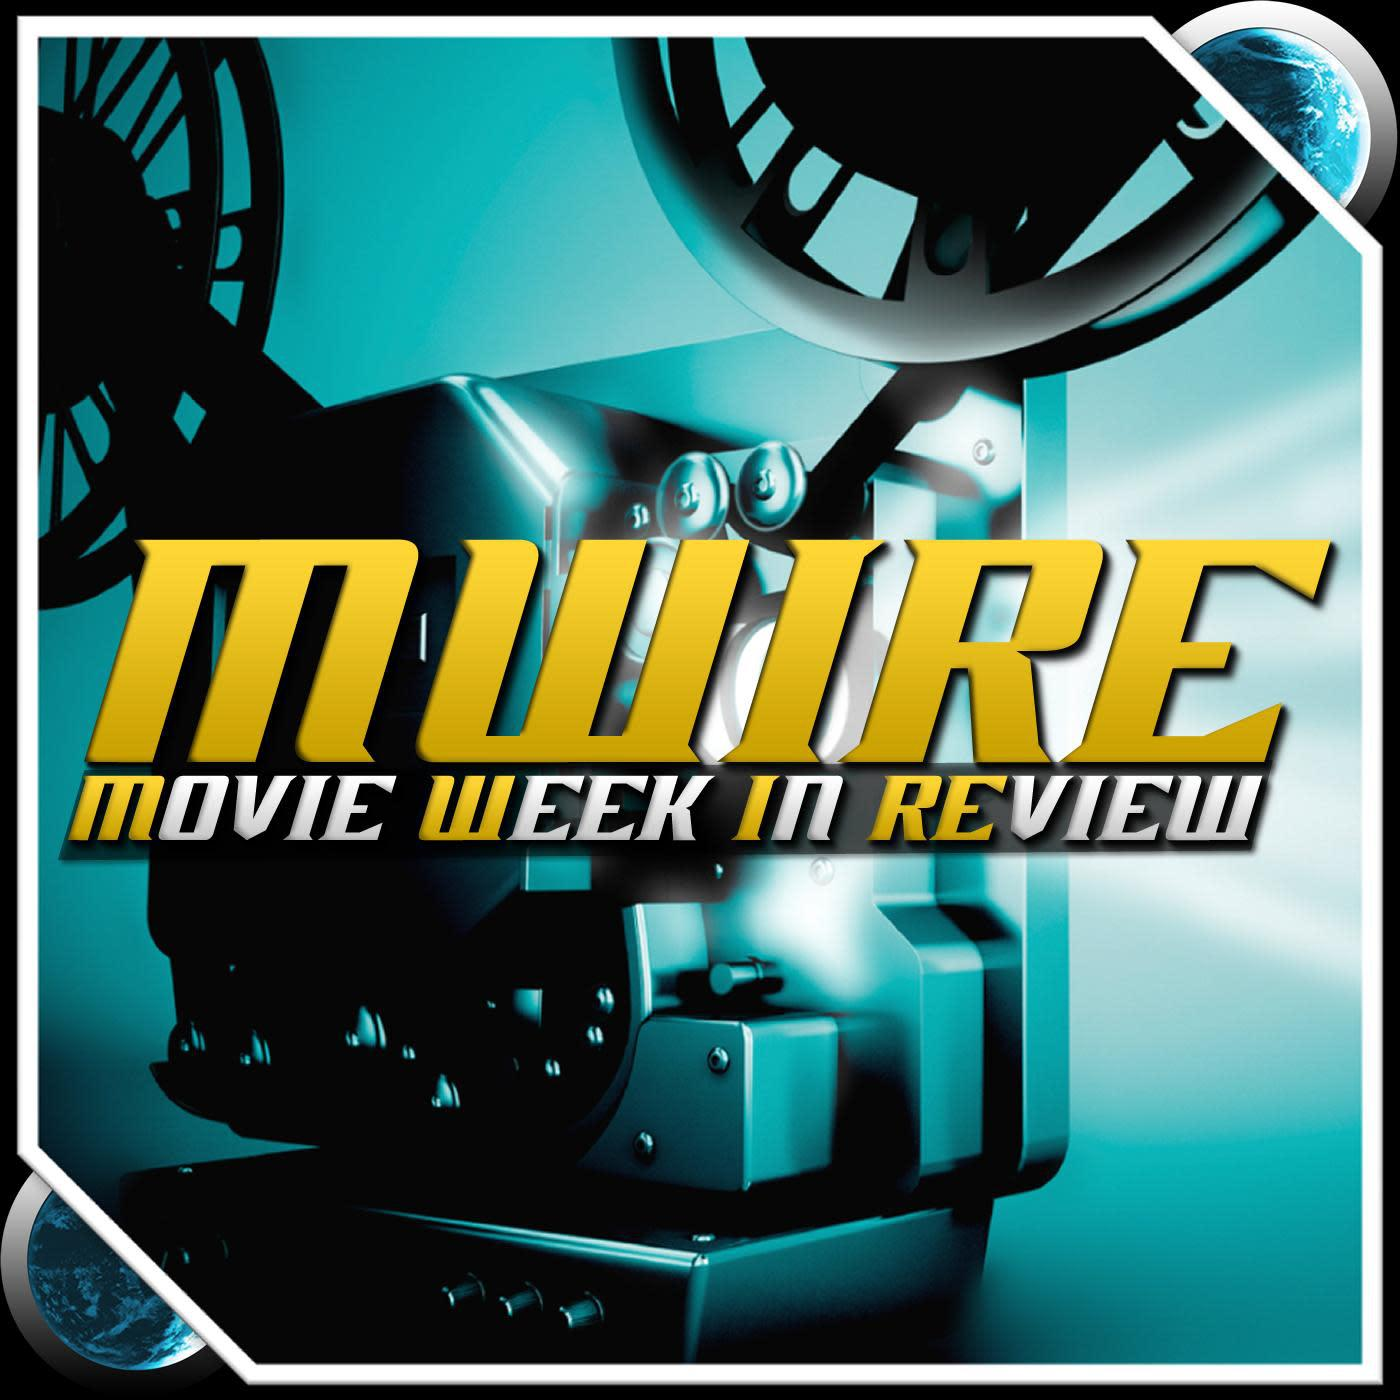 MWIRE - EP 199 - BAD XMAS FILMS! - Movie Week in Review